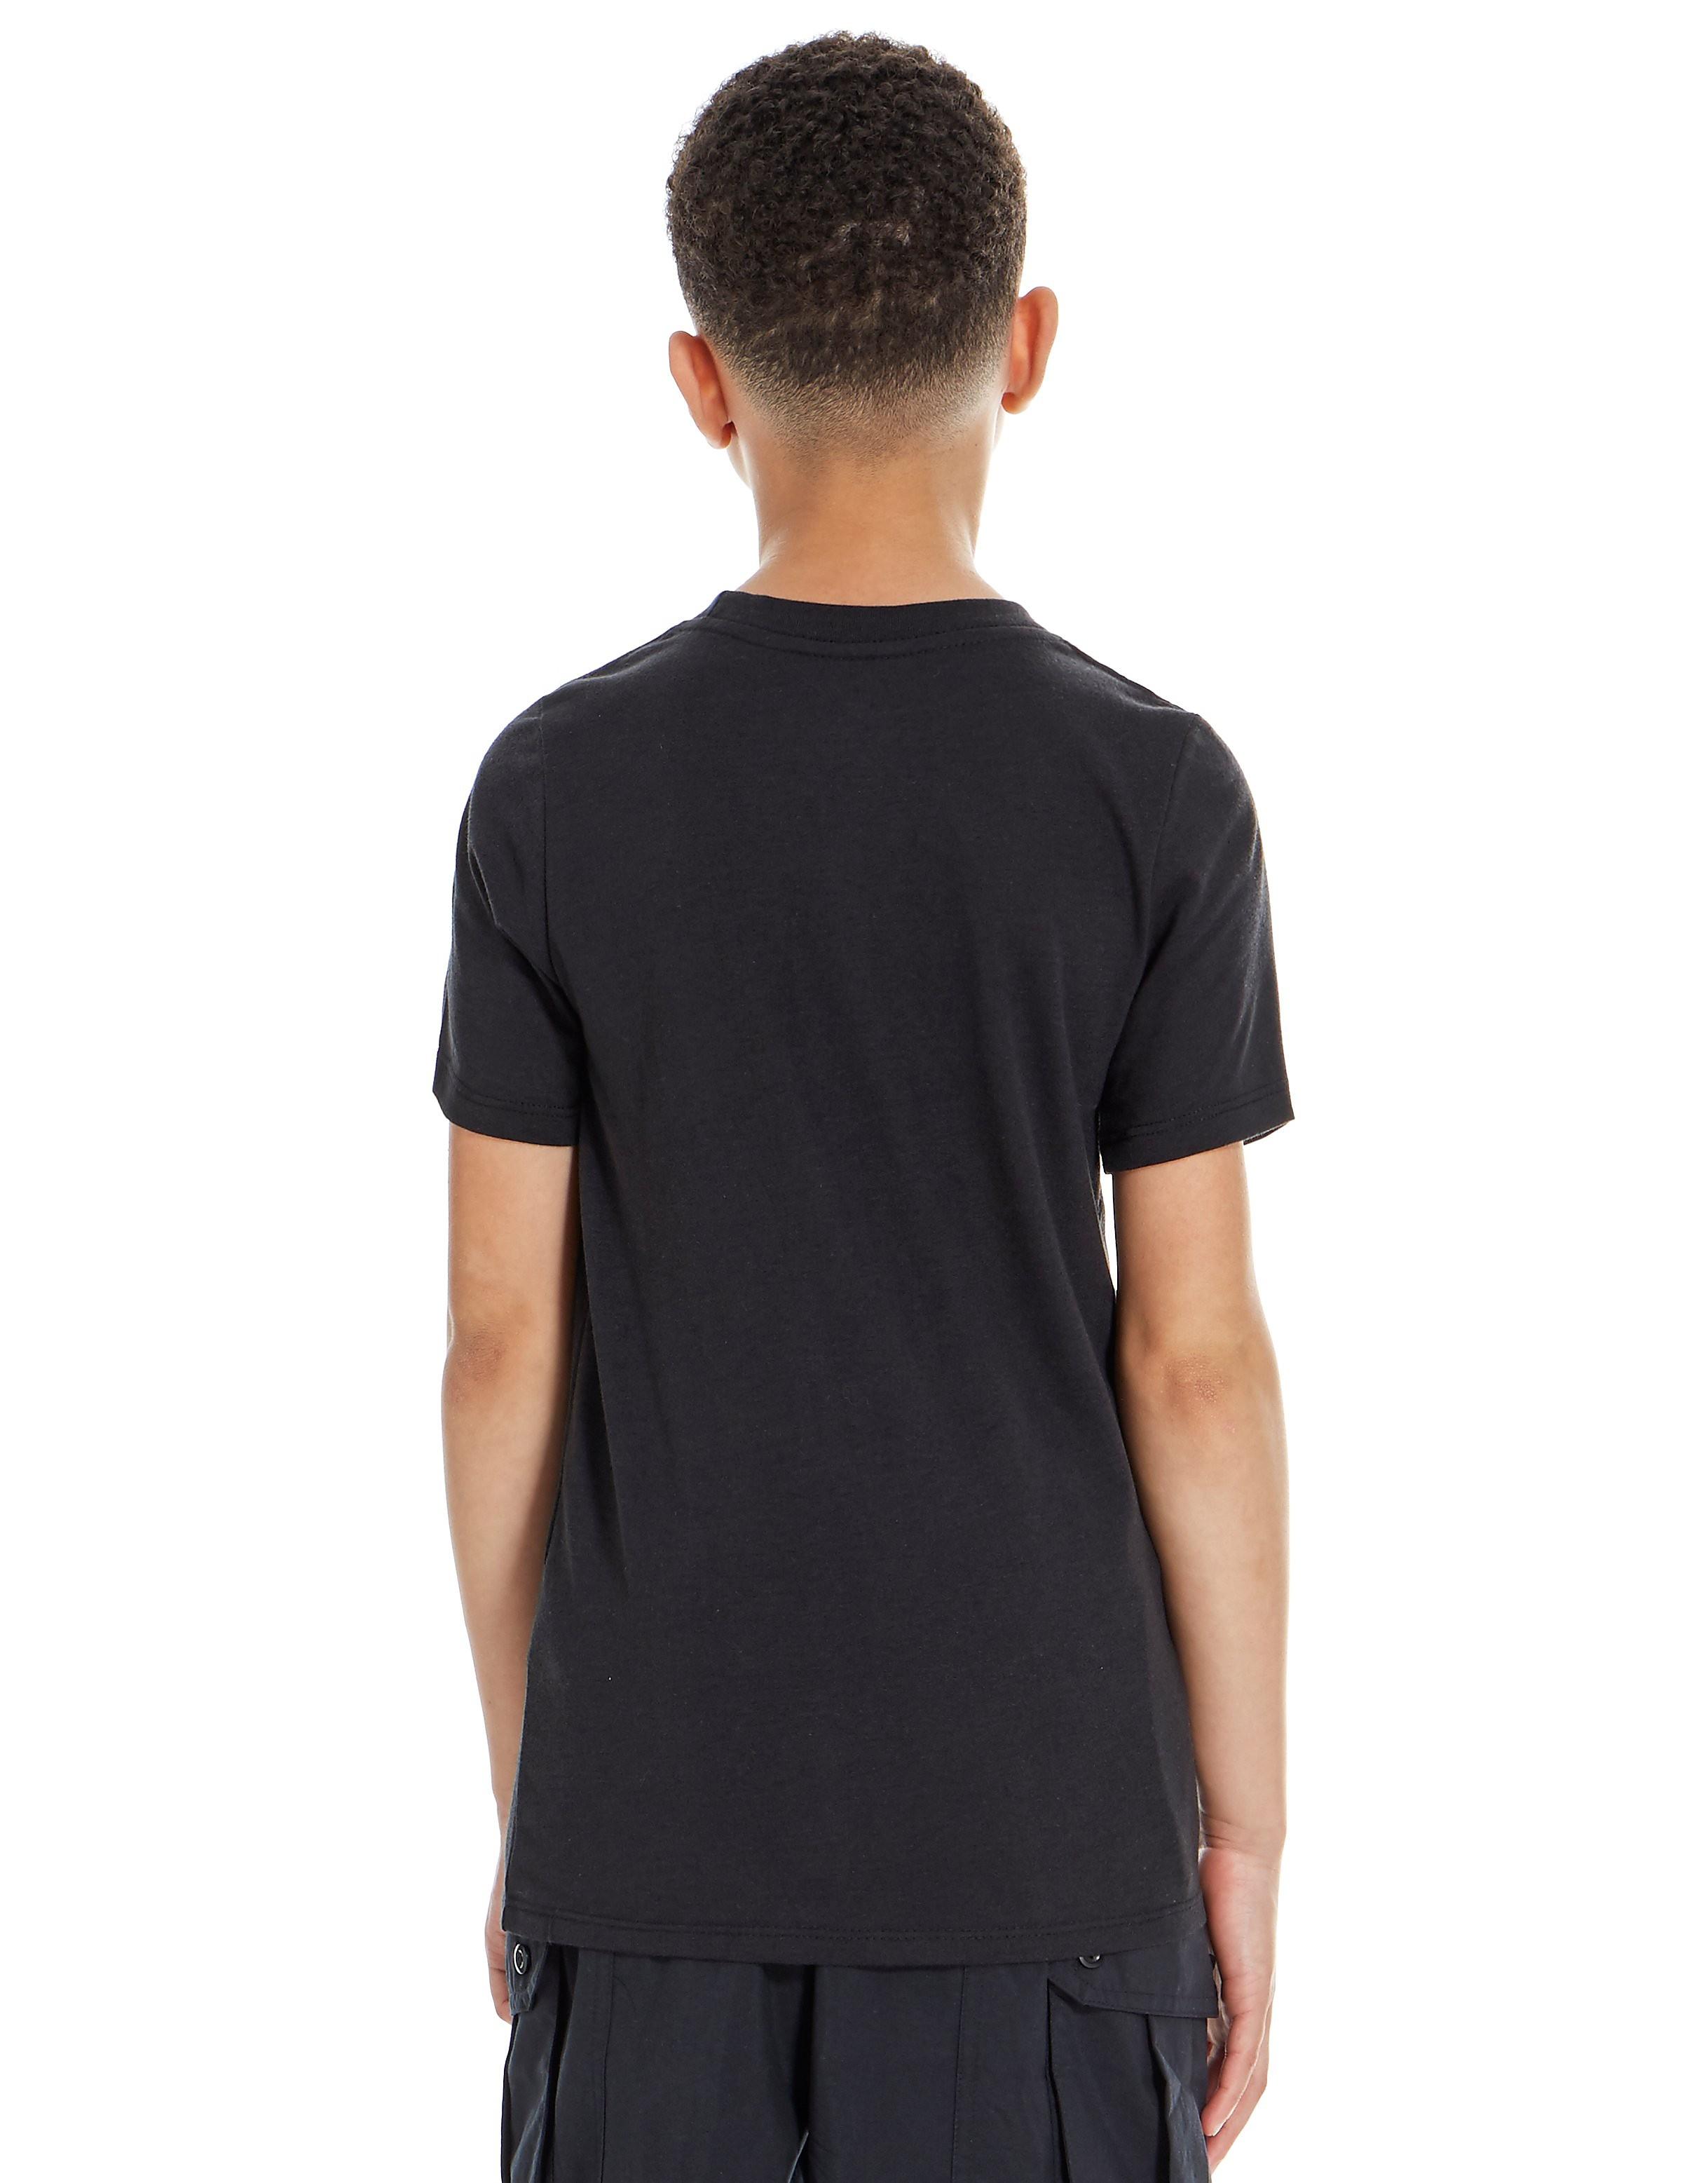 Nike Sportswear Air World T-Shirt Junior